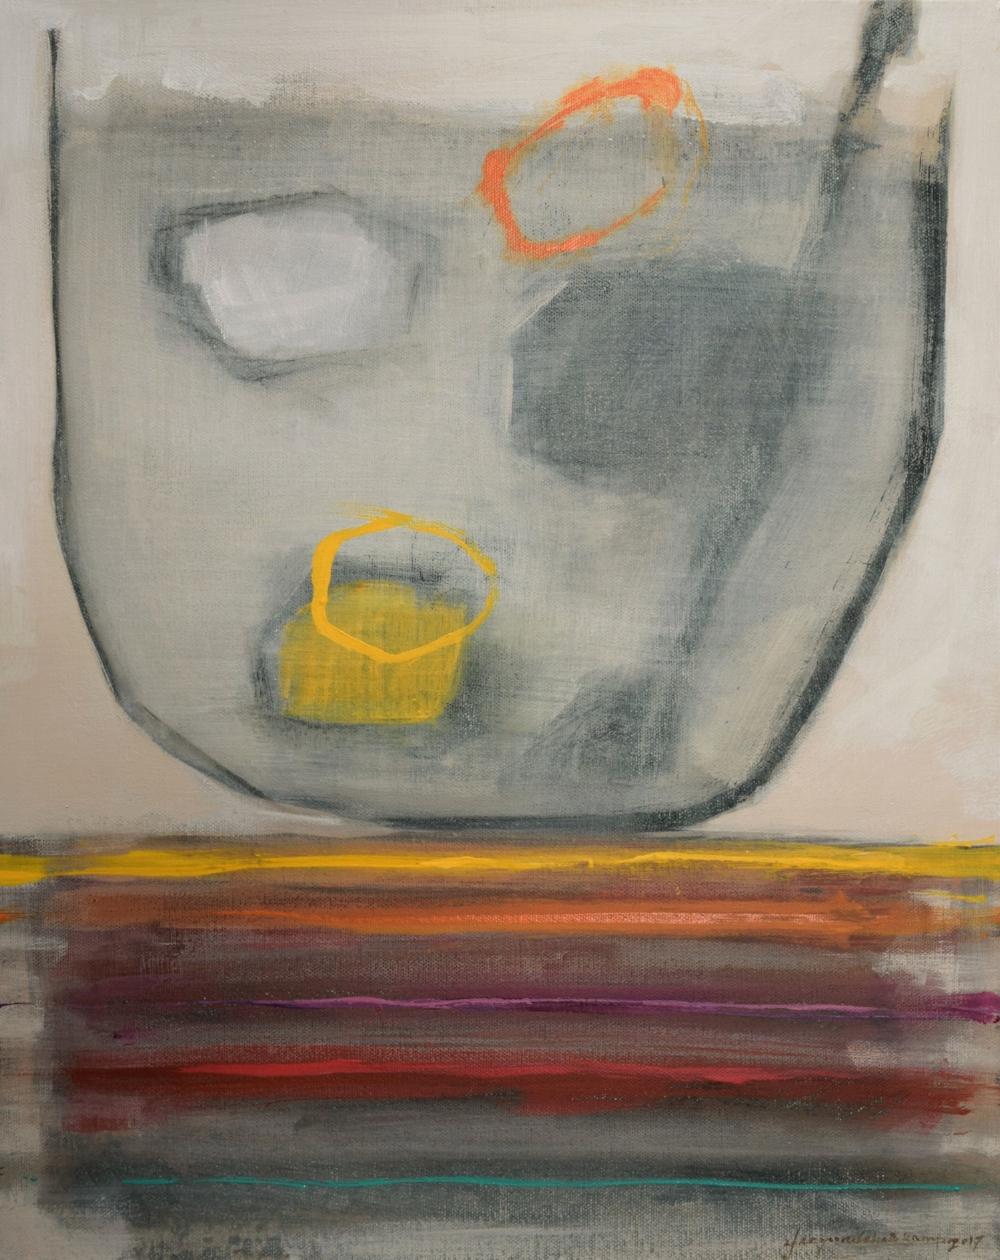 "Stone Soup, 2017  acrylic on canvas  16"" x 14"" x 1.5"""